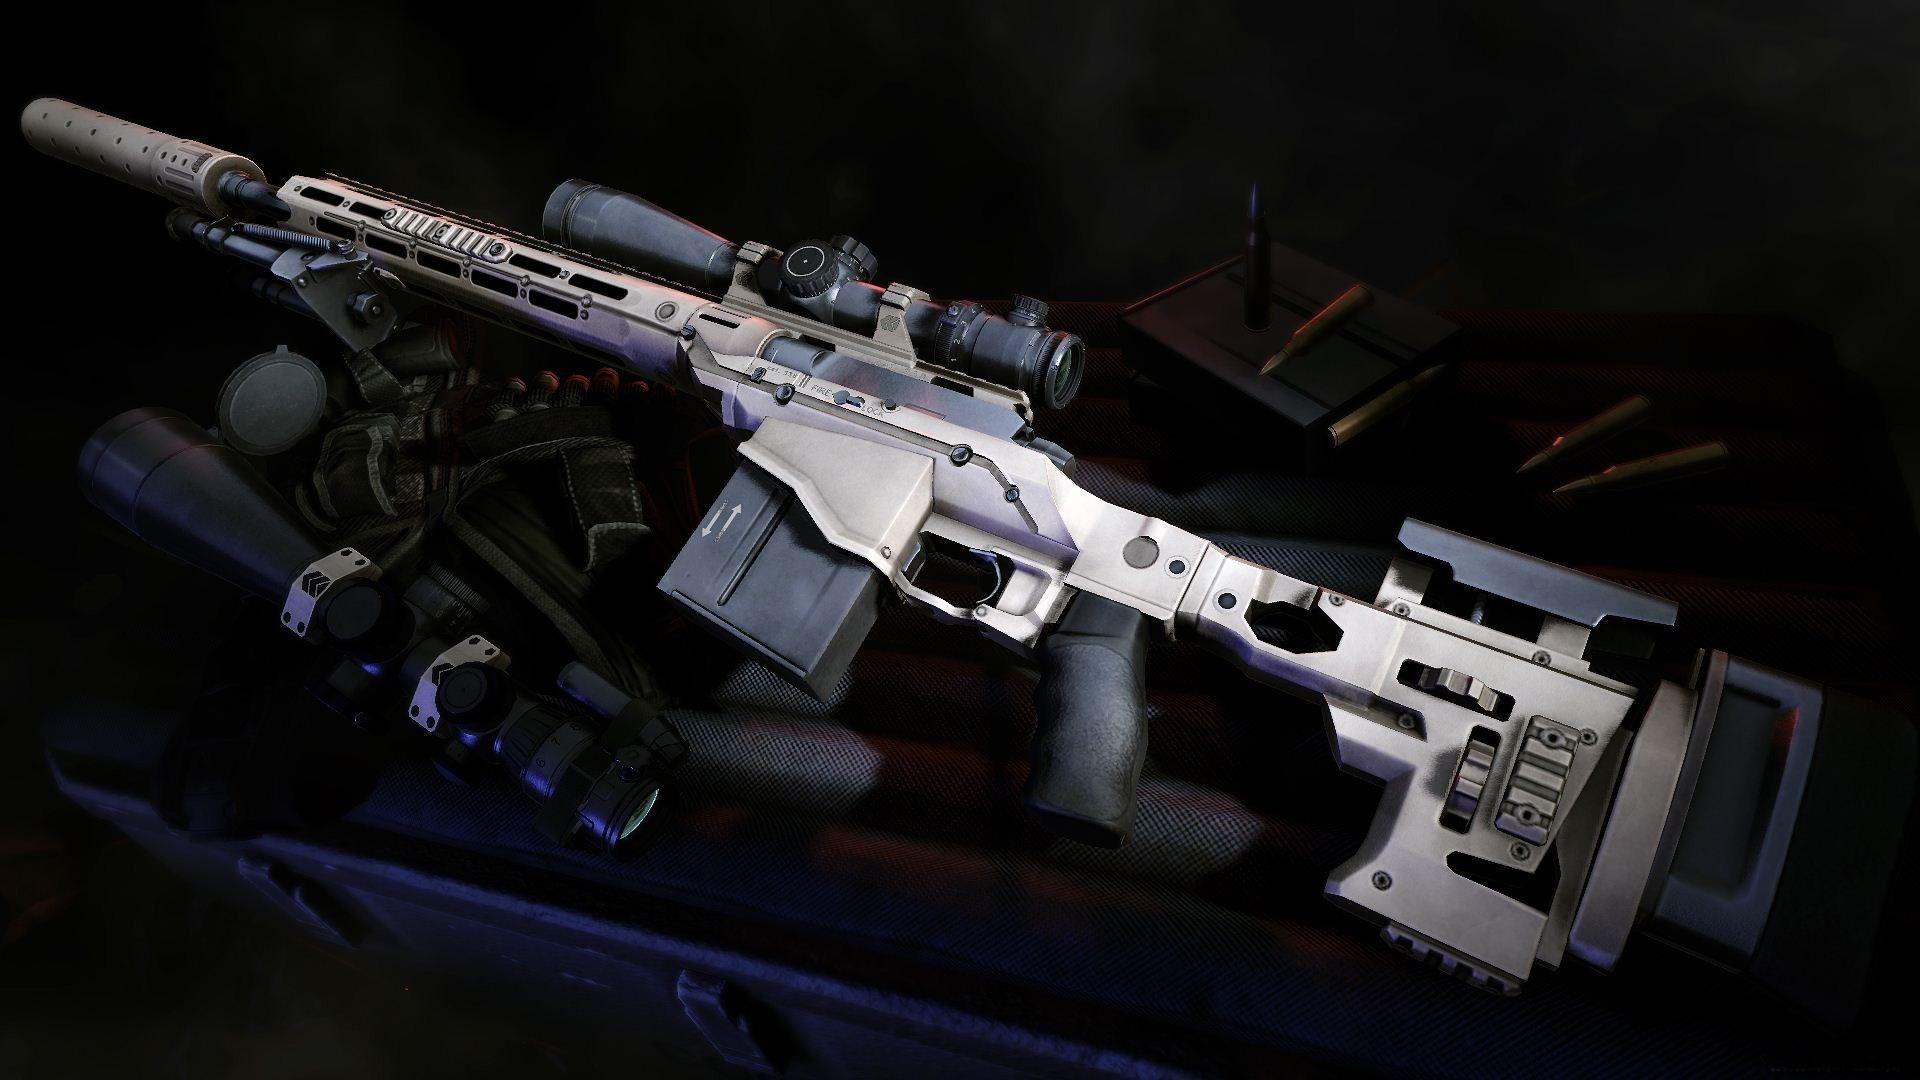 Sniper Rifle Wallpaper 44088 1920x1080 px HDWallSourcecom